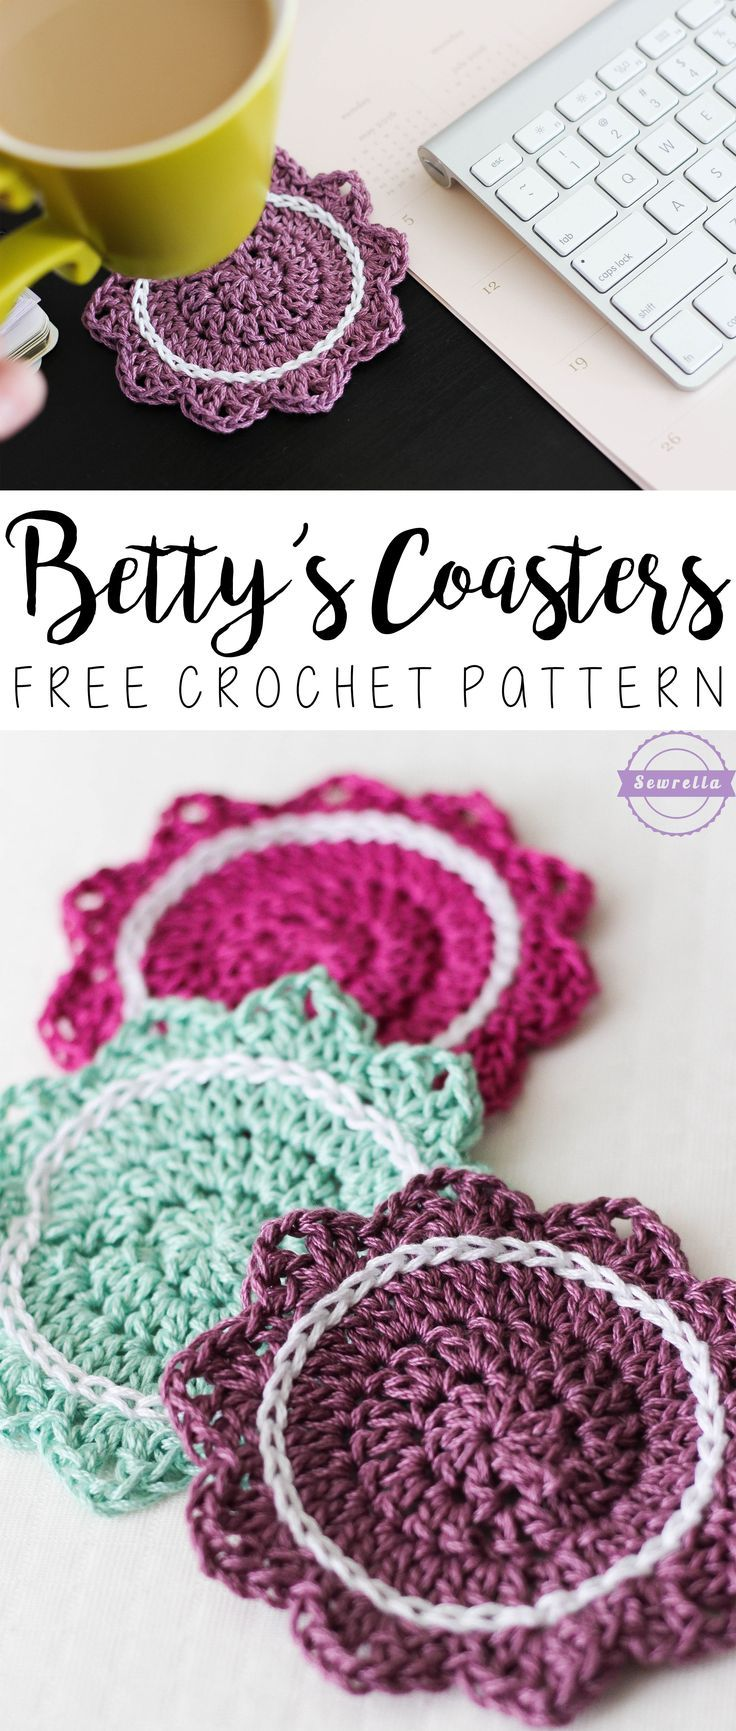 Betty's Coasters   Summer Kitchen Series   Free Crochet Pattern from Sewrella